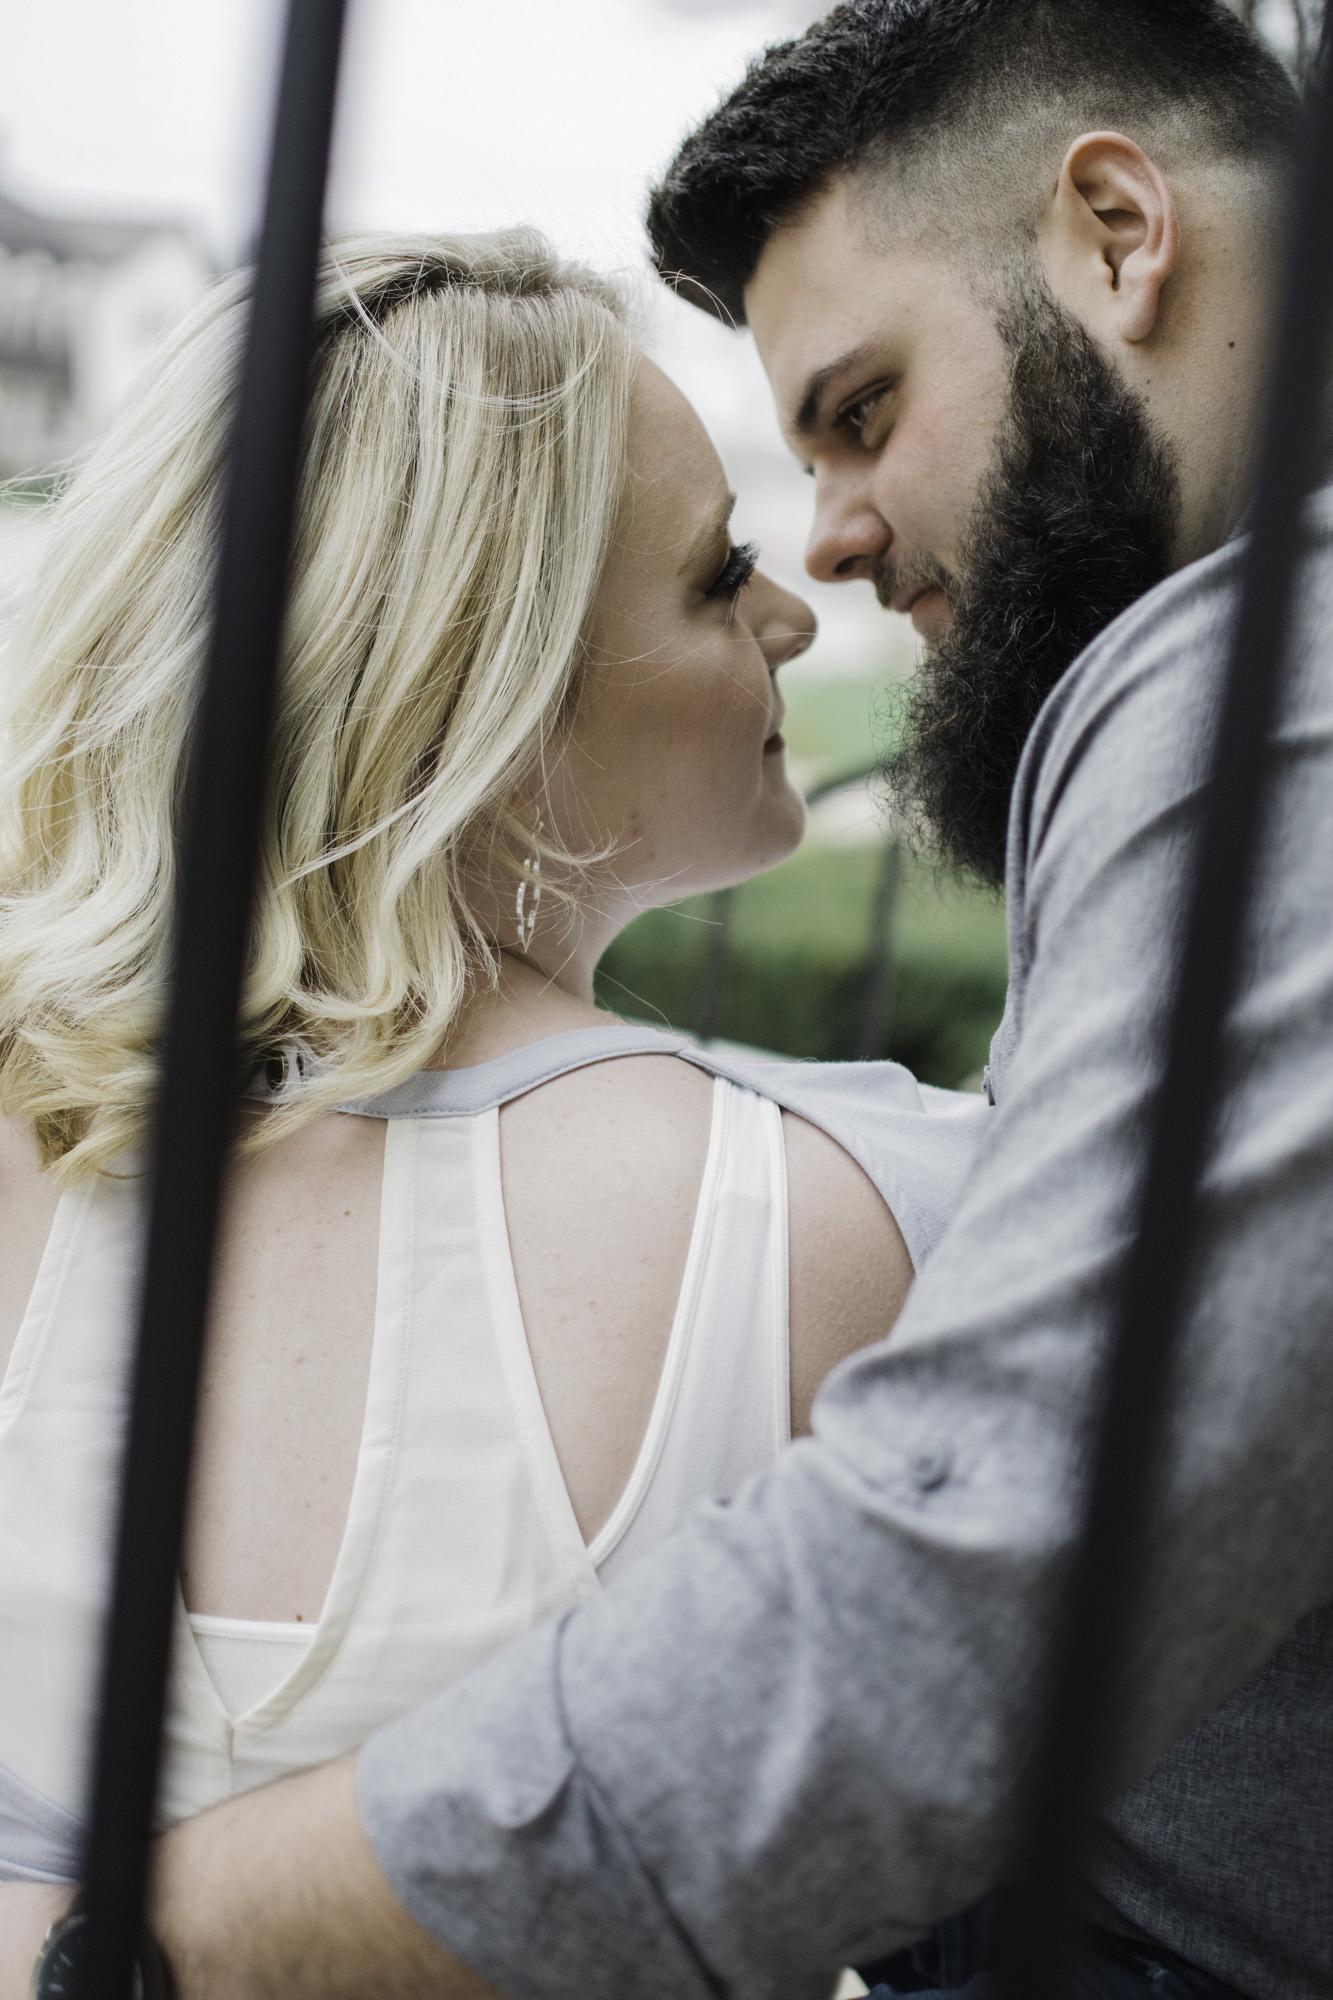 Cate_Ann_Photography_Dayton_Ohio_Wedding_And_Engagement_PhotographerDSC_2781.jpg